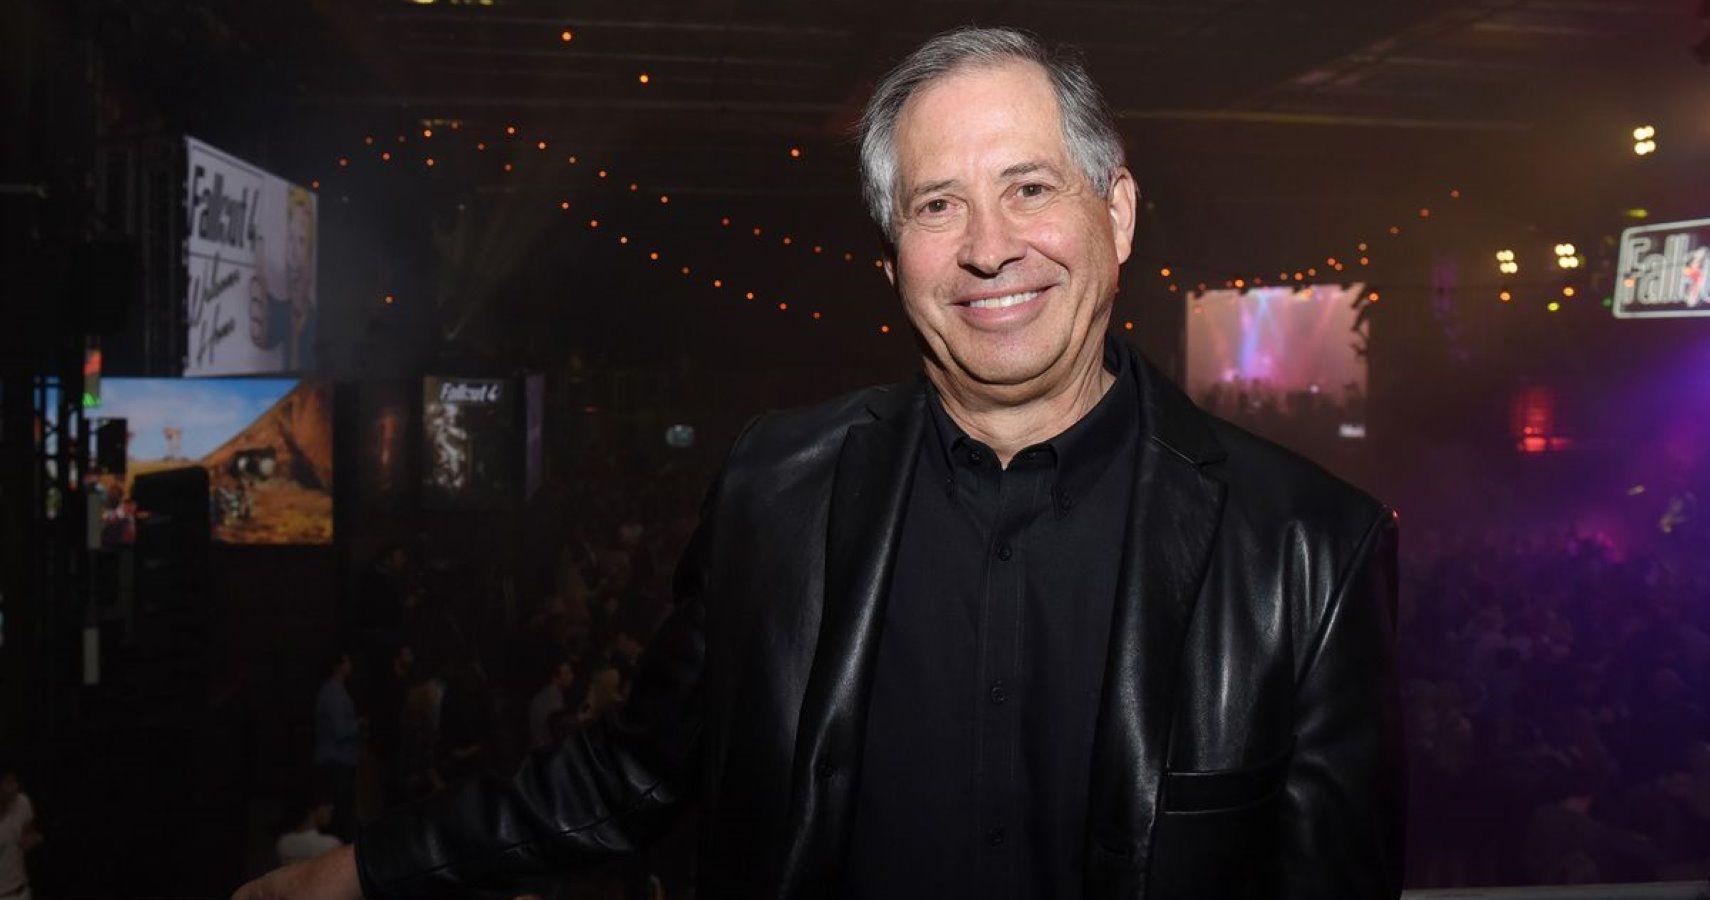 ZeniMax Media Co-Founder And CEO Robert Altman Has Passed Away